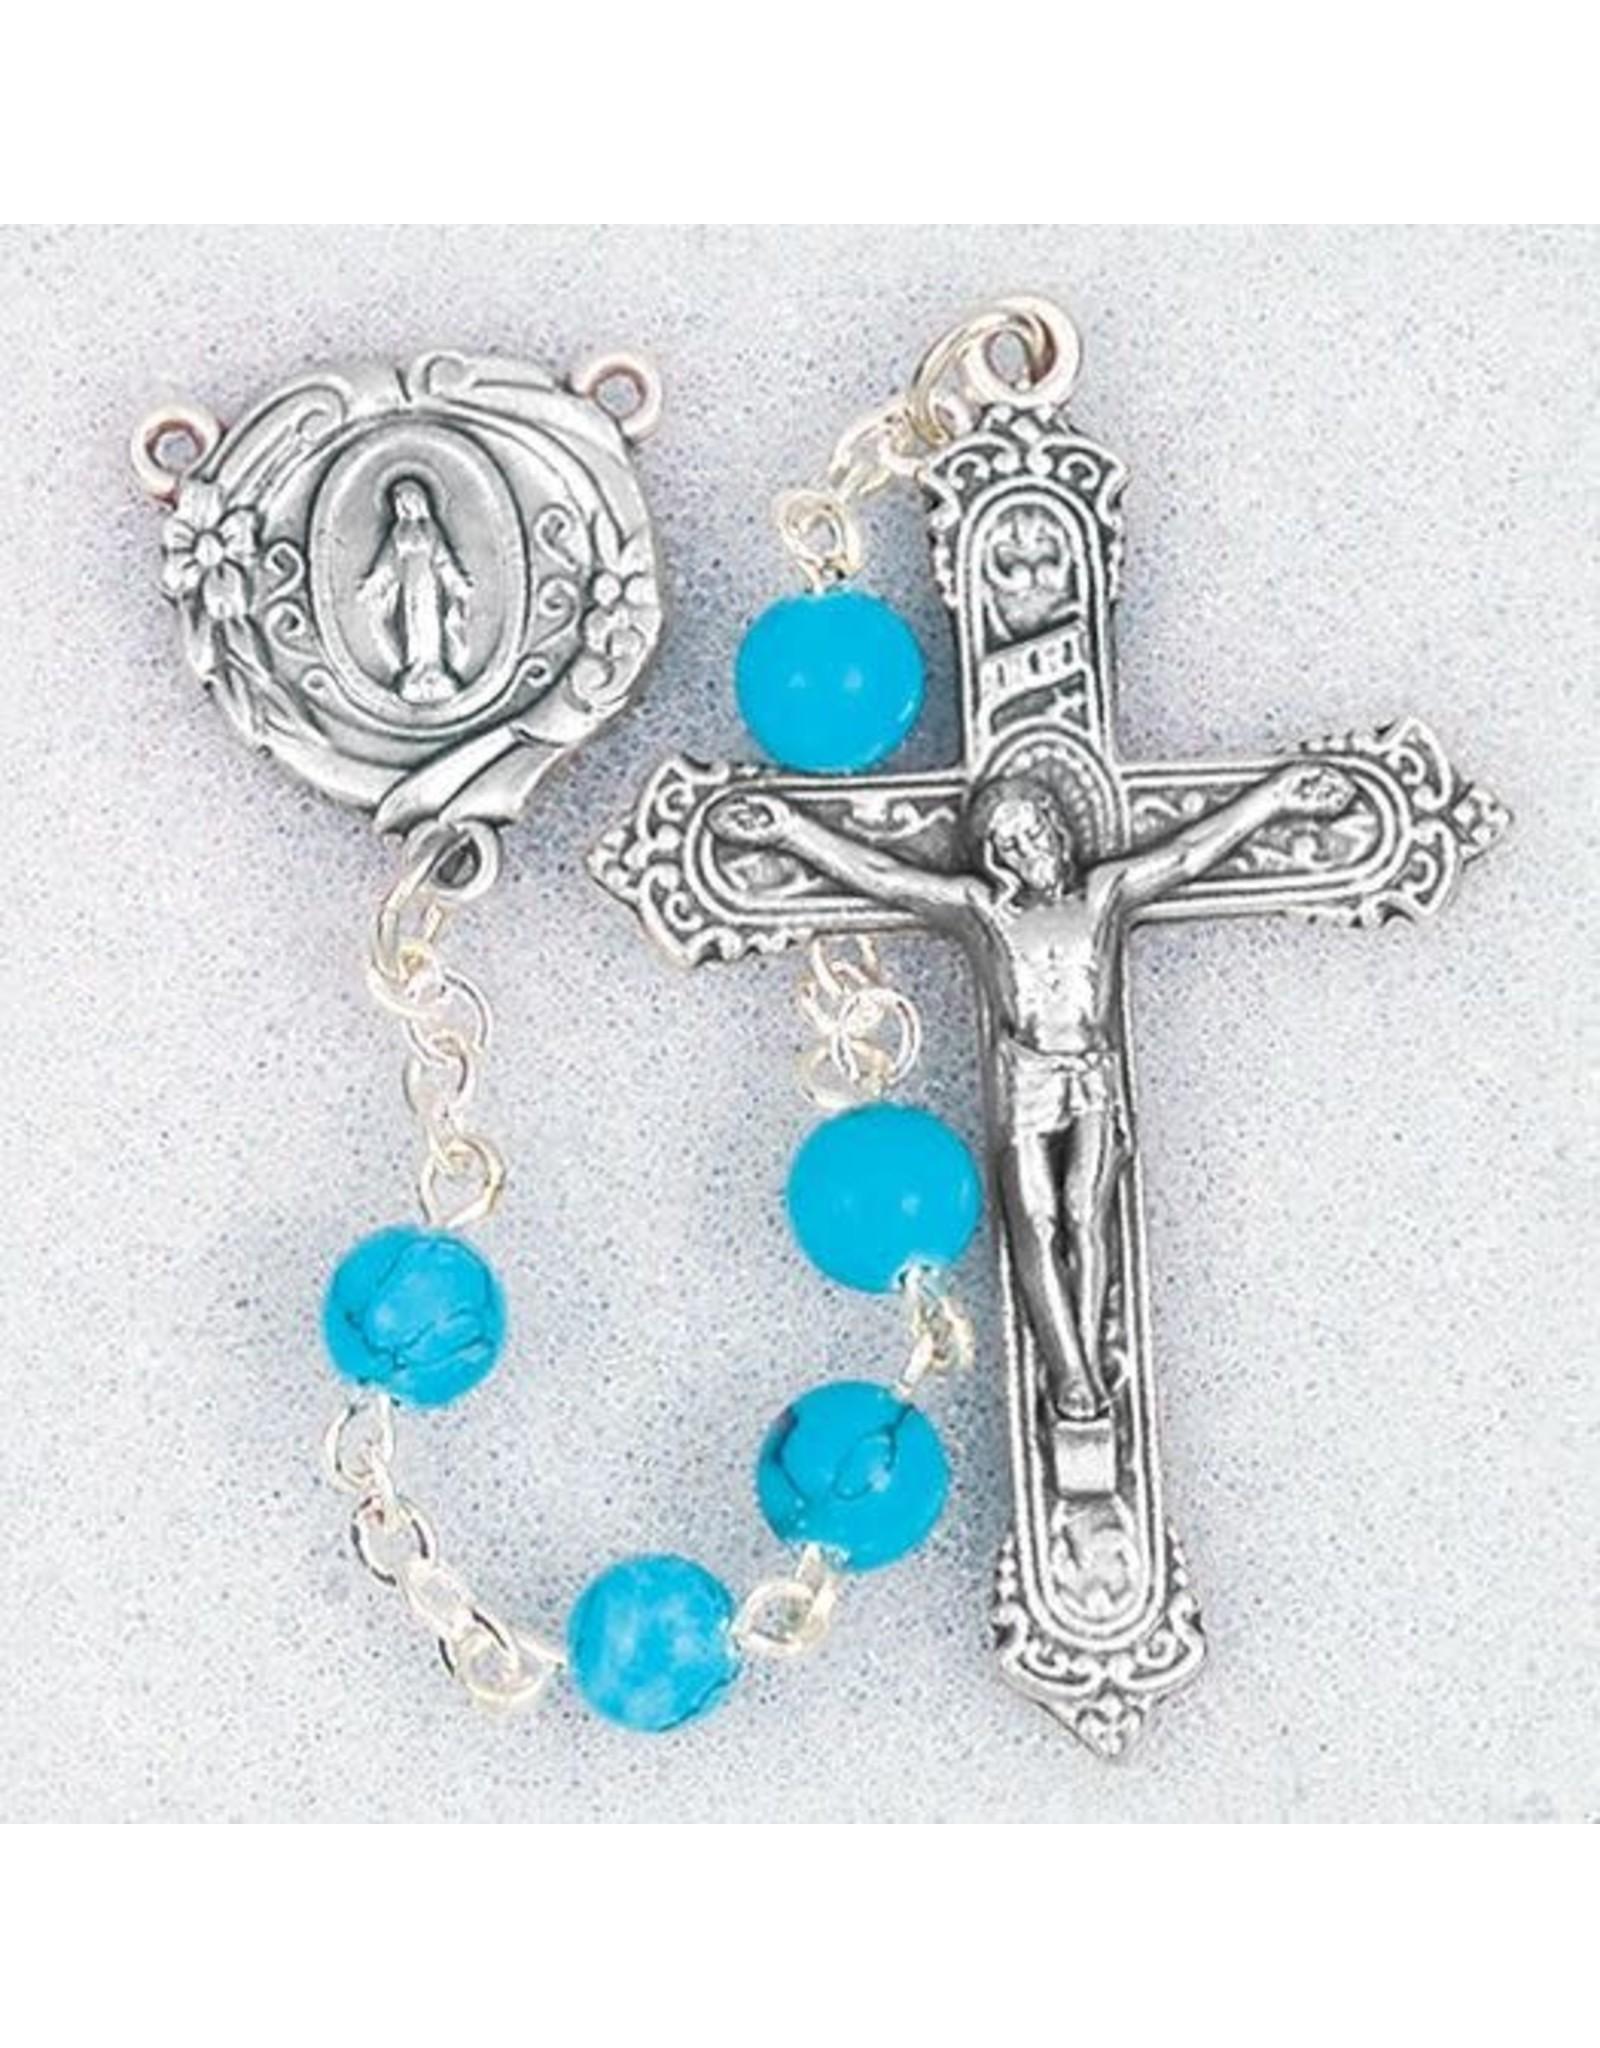 Hirten 6mm Turquoise Bead Rosary, Boxed